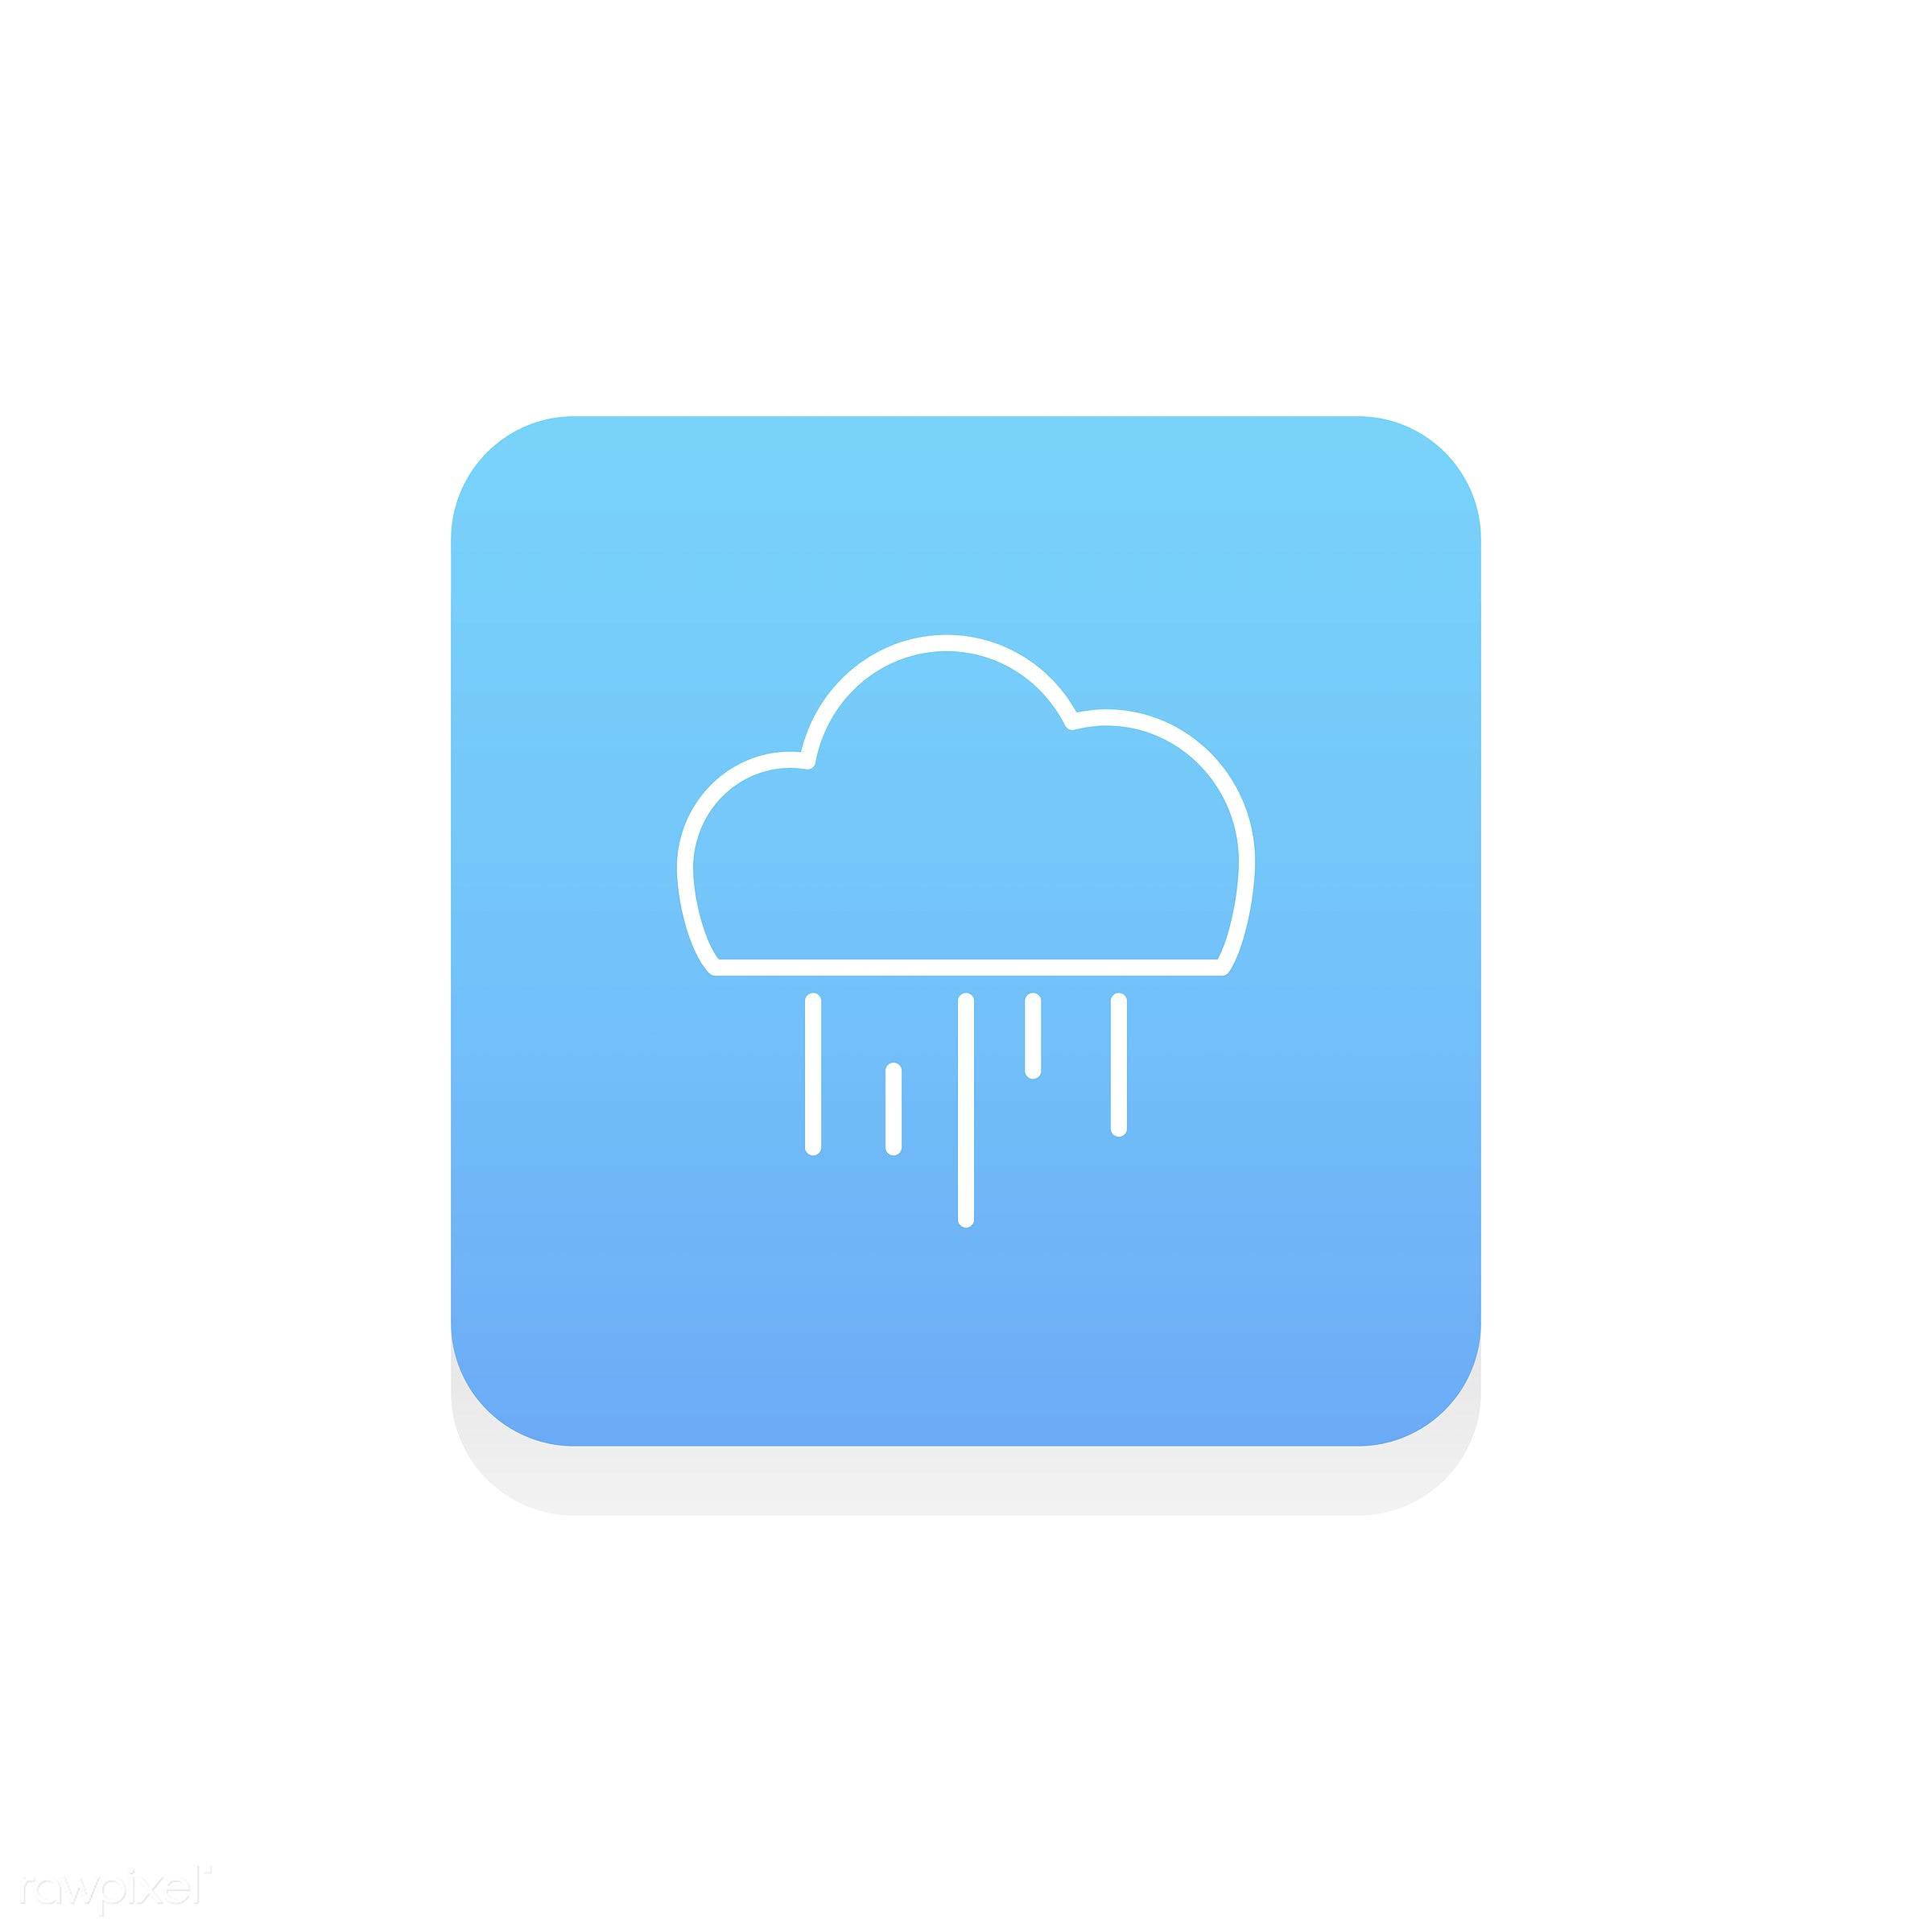 Vector of weather icon - design, flat, graphic, icon, illustration, isolated, layout, platform, Season, style, symbol,...